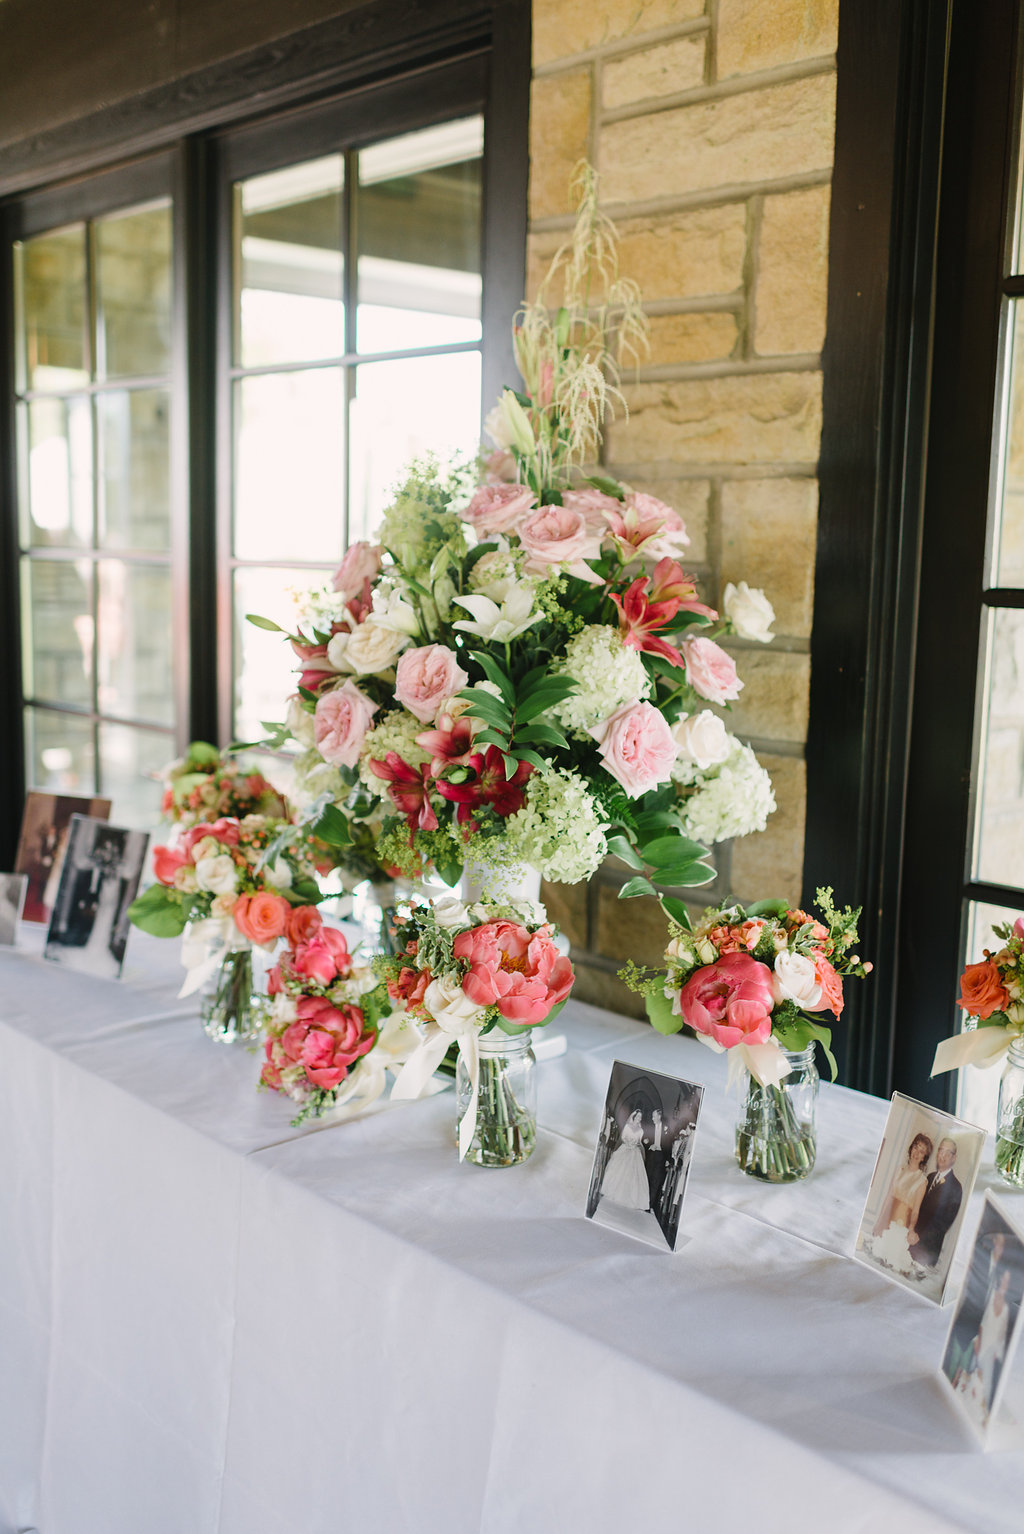 Cameron-Powel-Wes-Mize-wedding-20160618-453.jpg